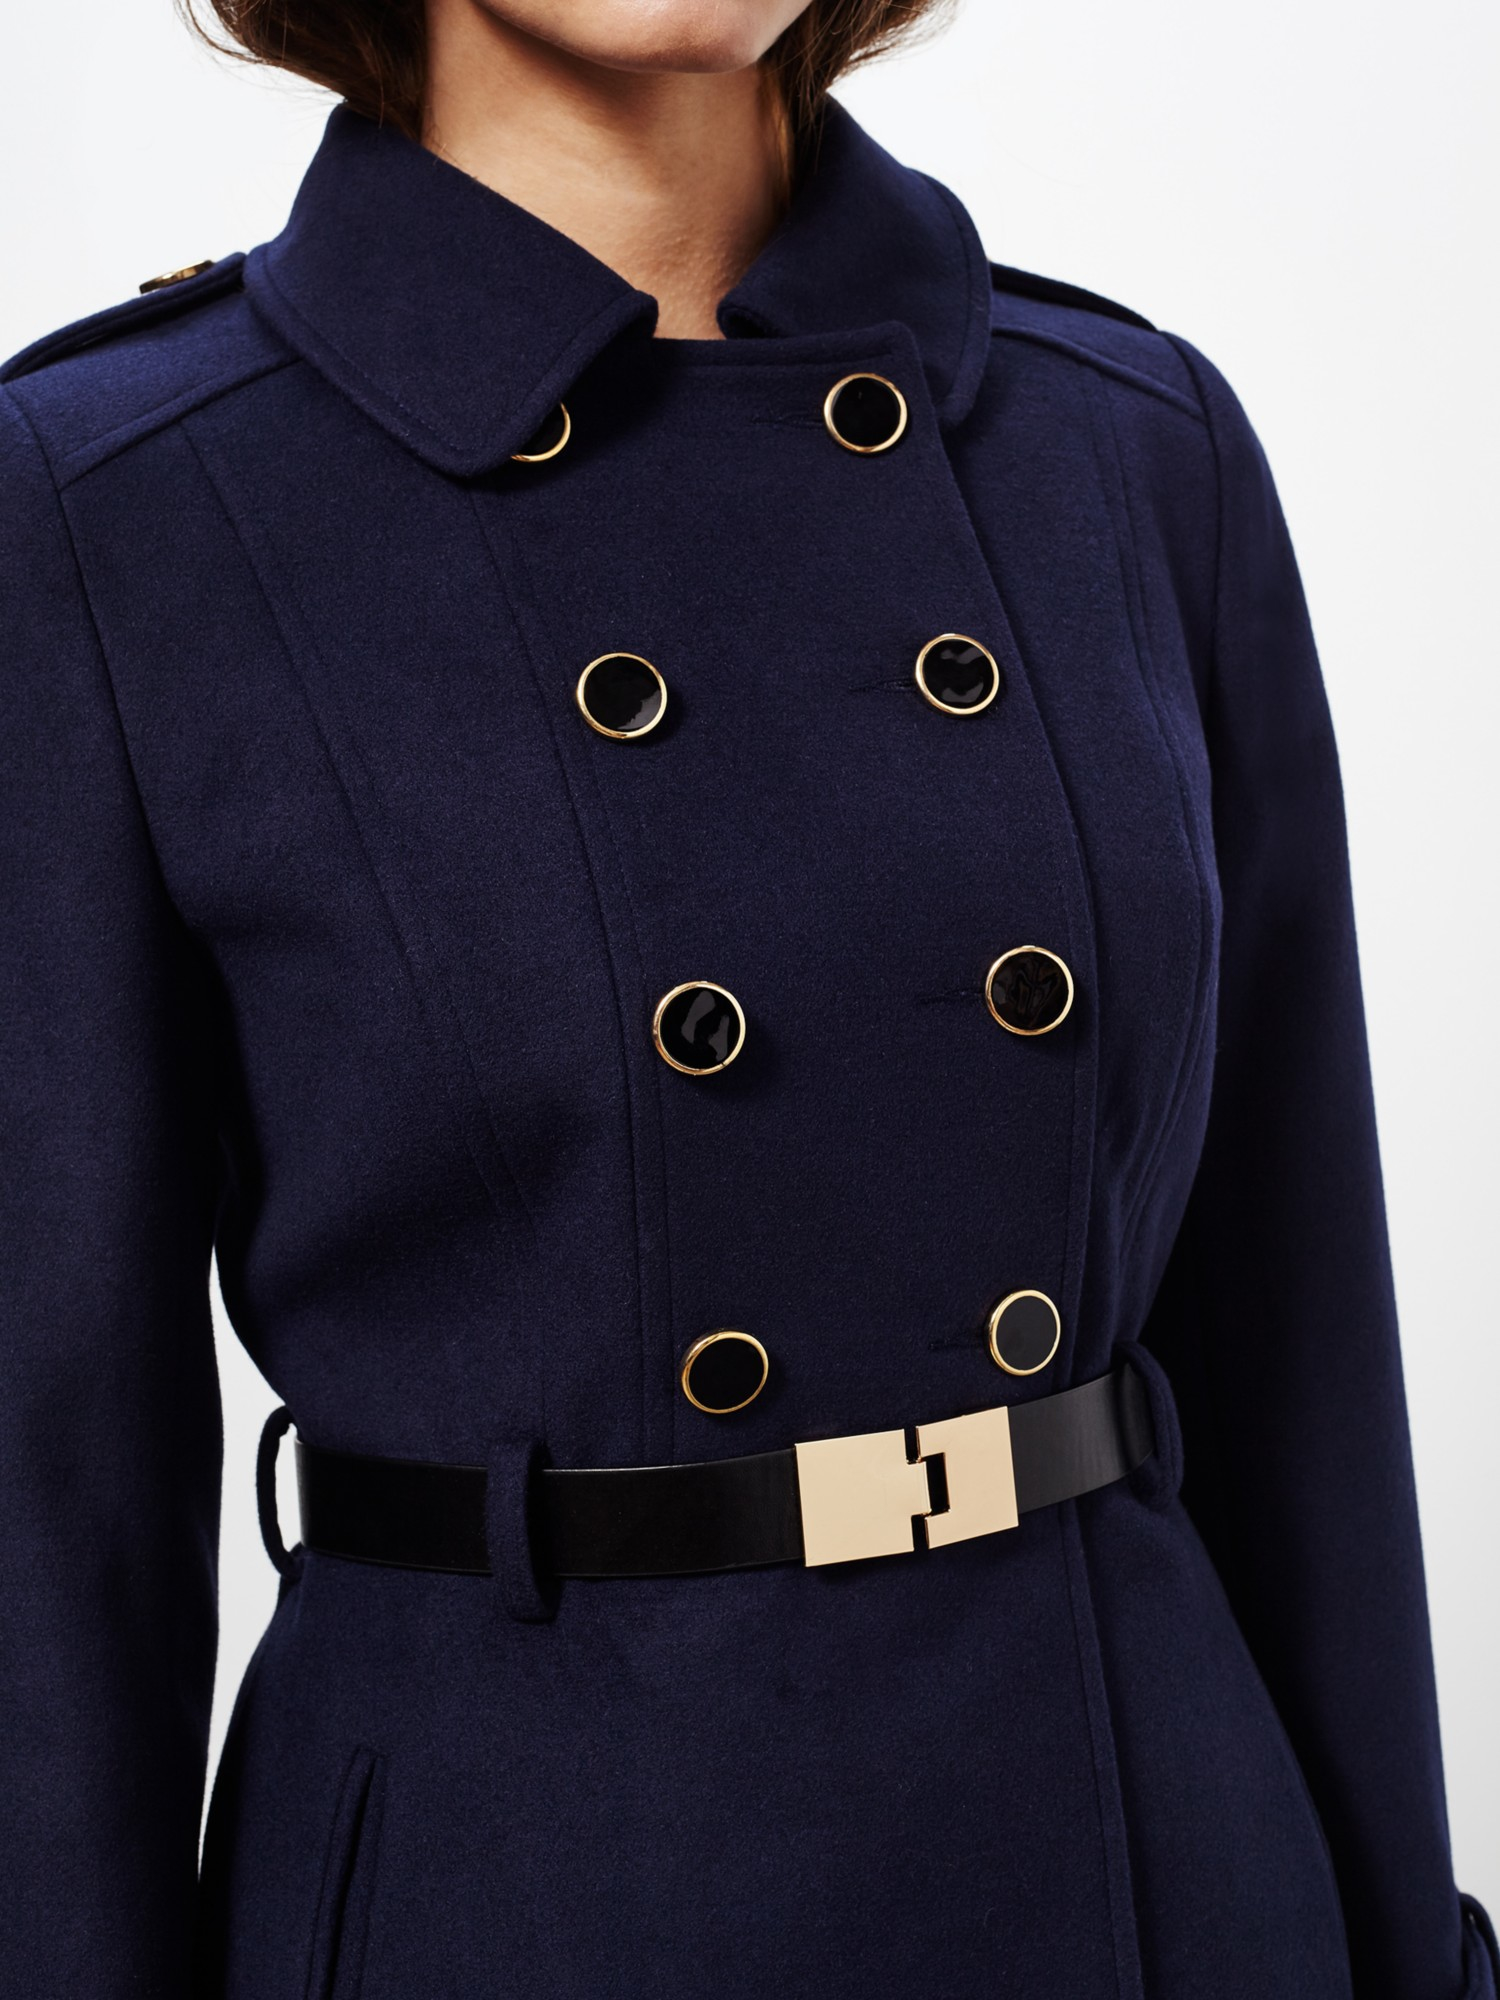 Miss selfridge Petite Military Coat in Blue   Lyst